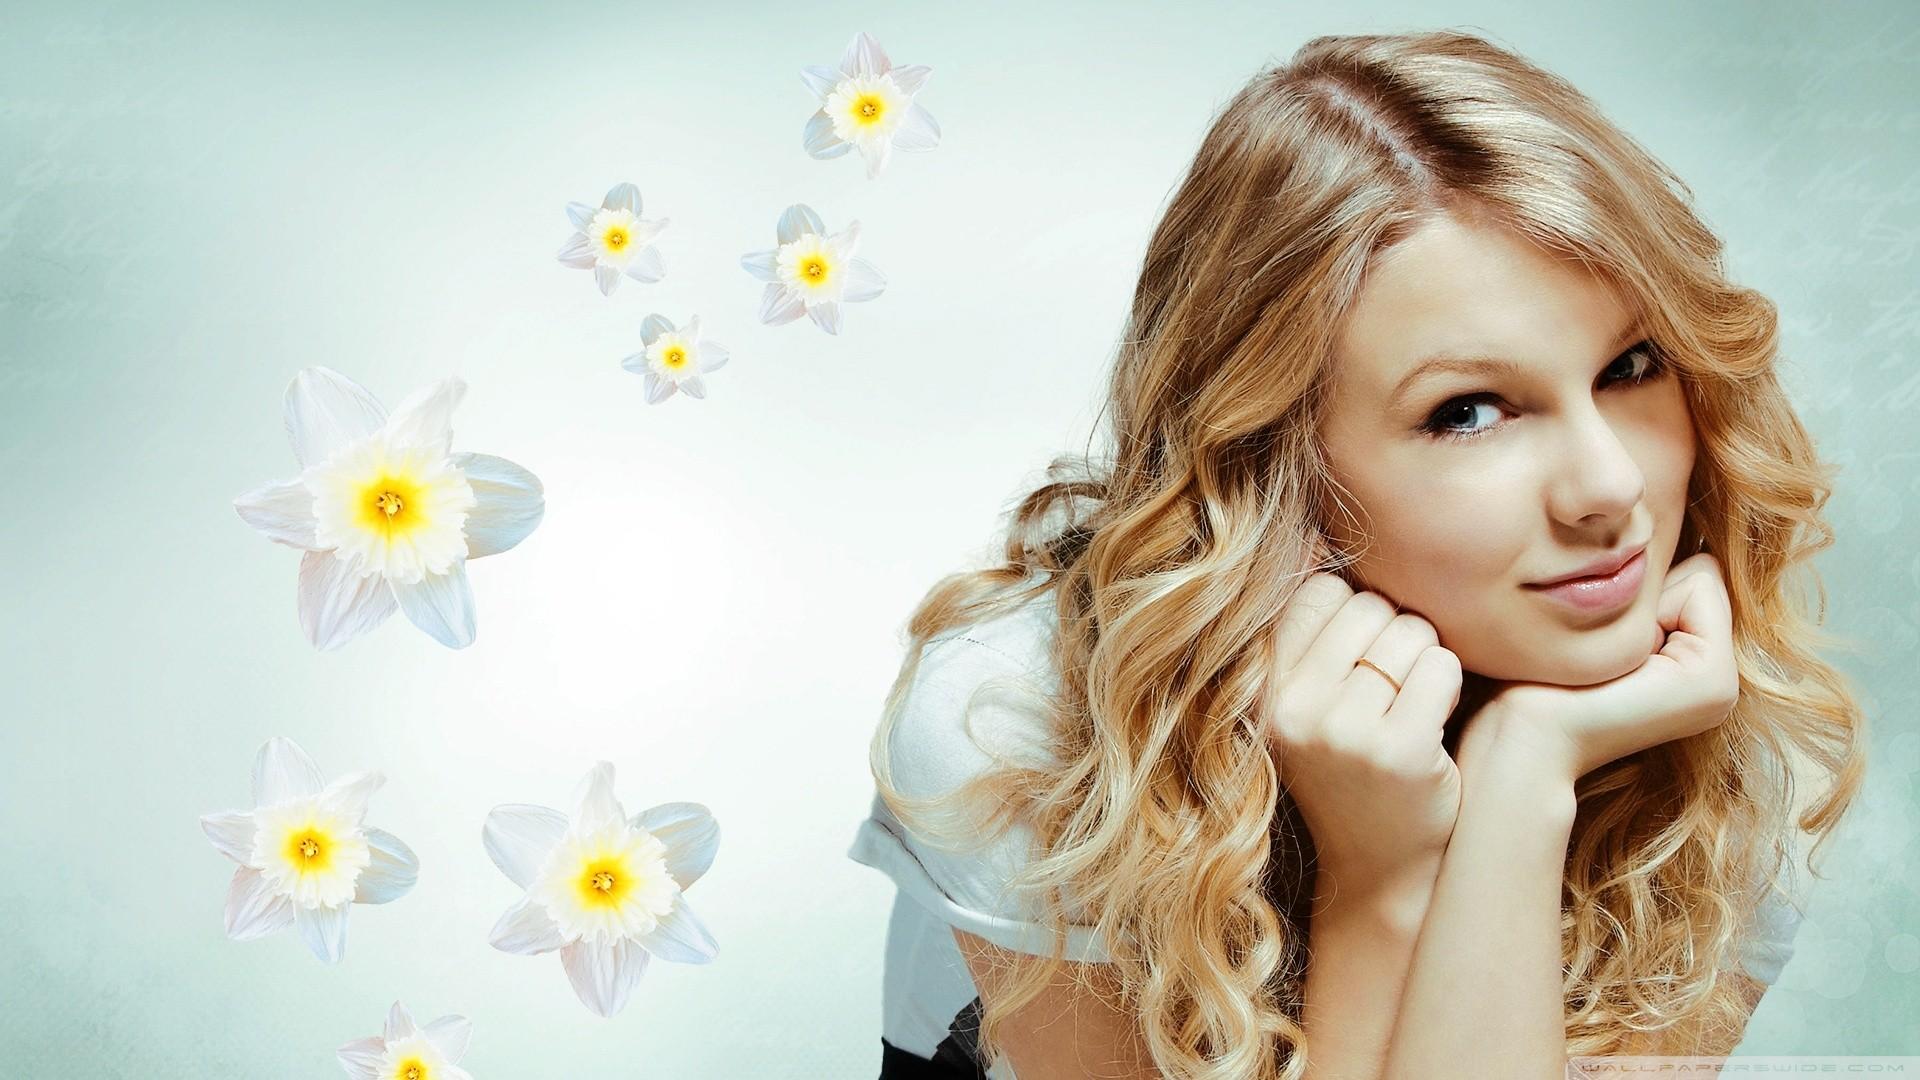 Taylor swift sunflower wallpaper